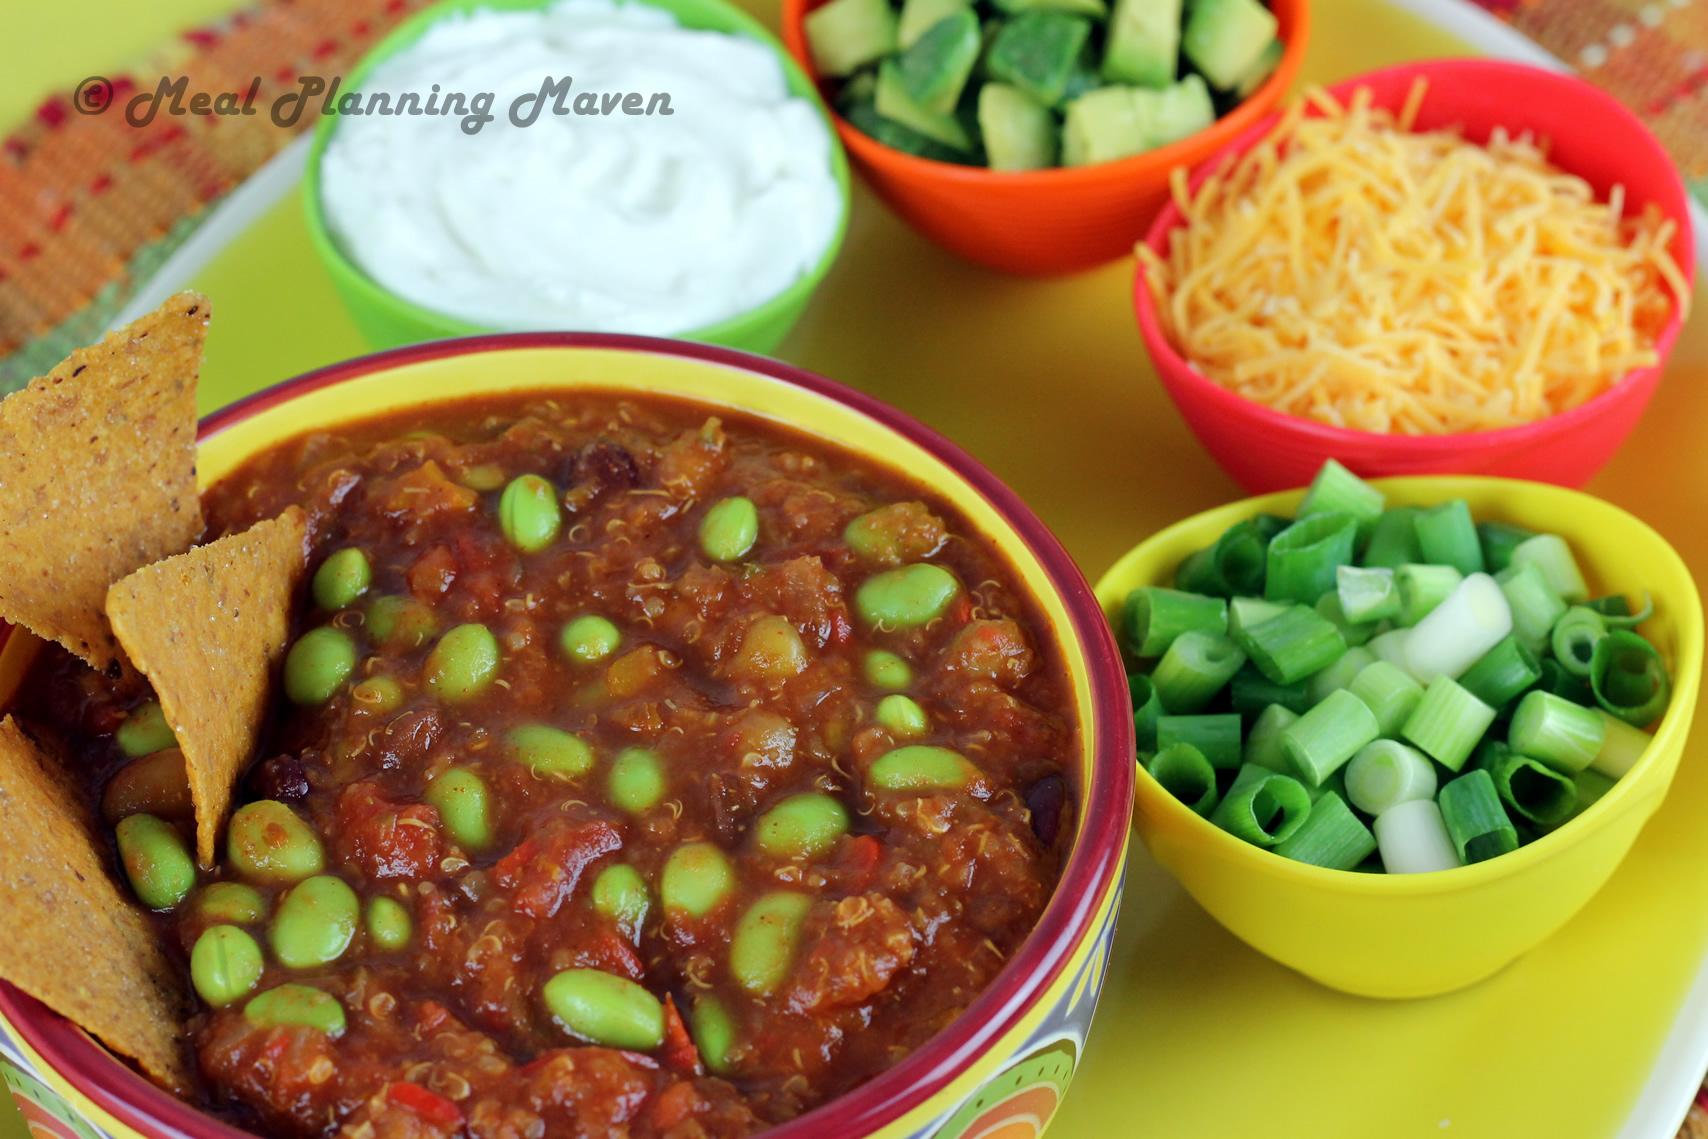 Crockpot Mexican Jumping Bean Chili